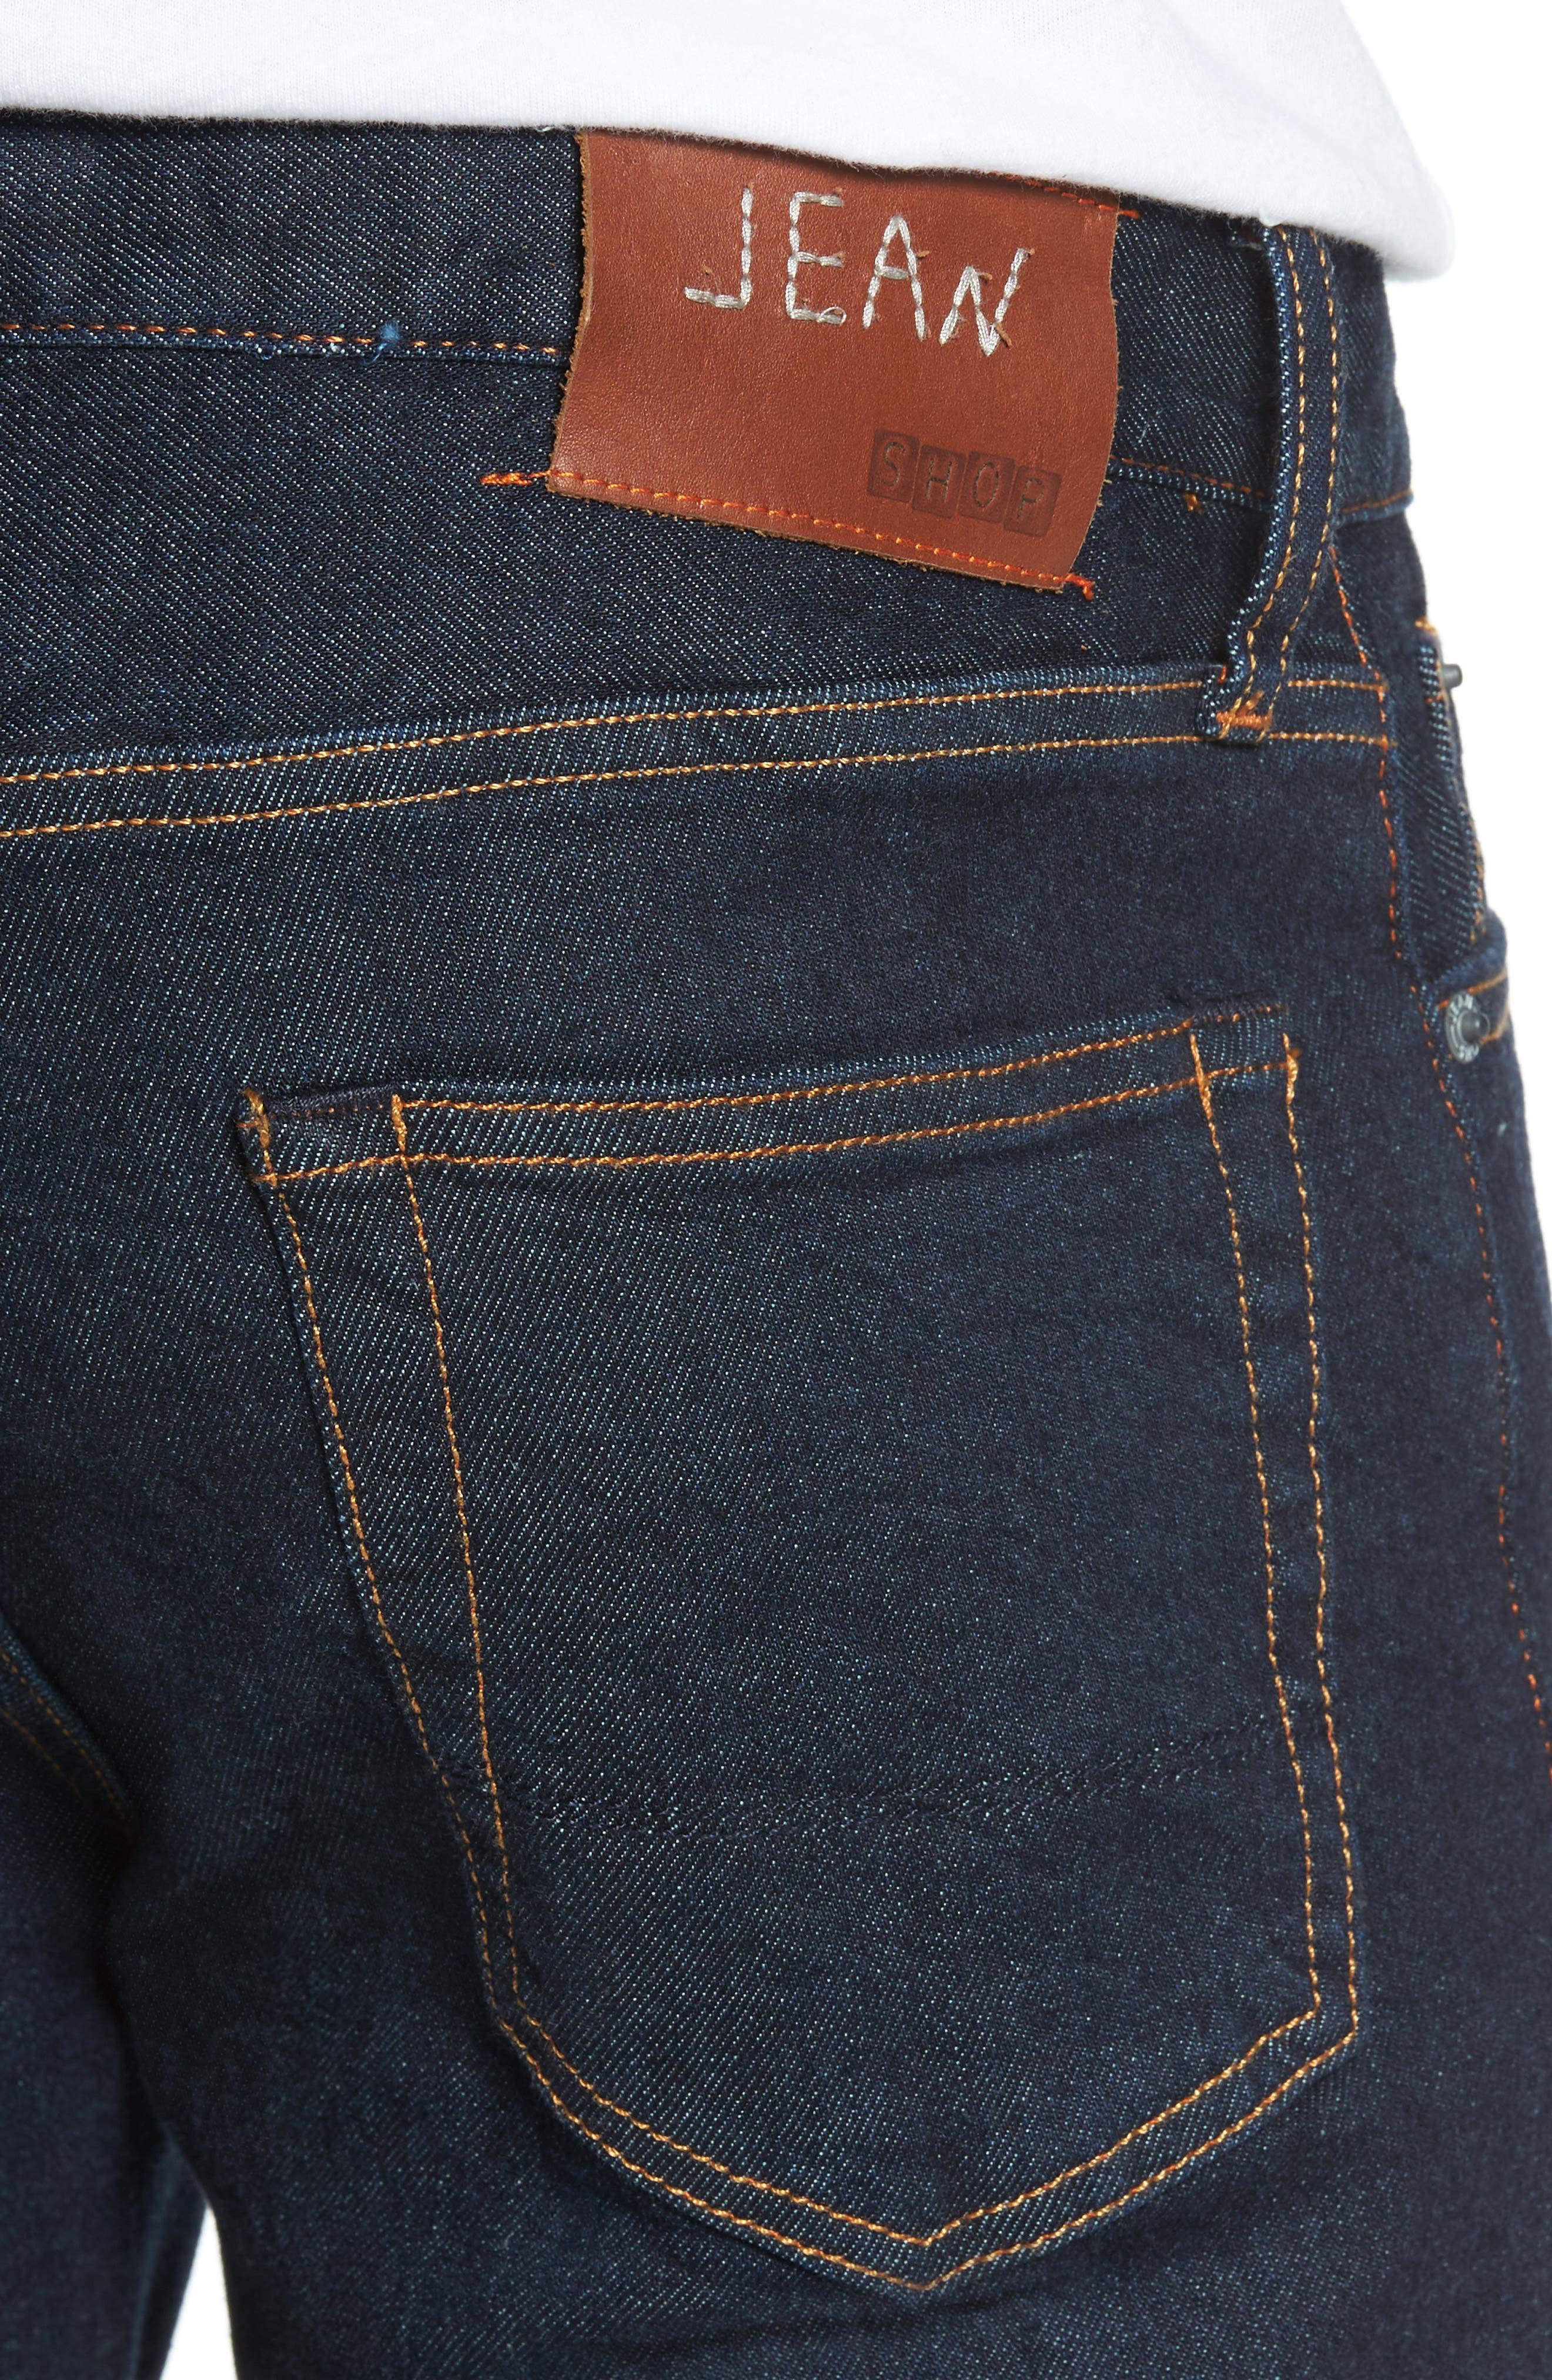 Jim Slim Fit Selvedge Jeans,                             Alternate thumbnail 4, color,                             Stretch Rinse